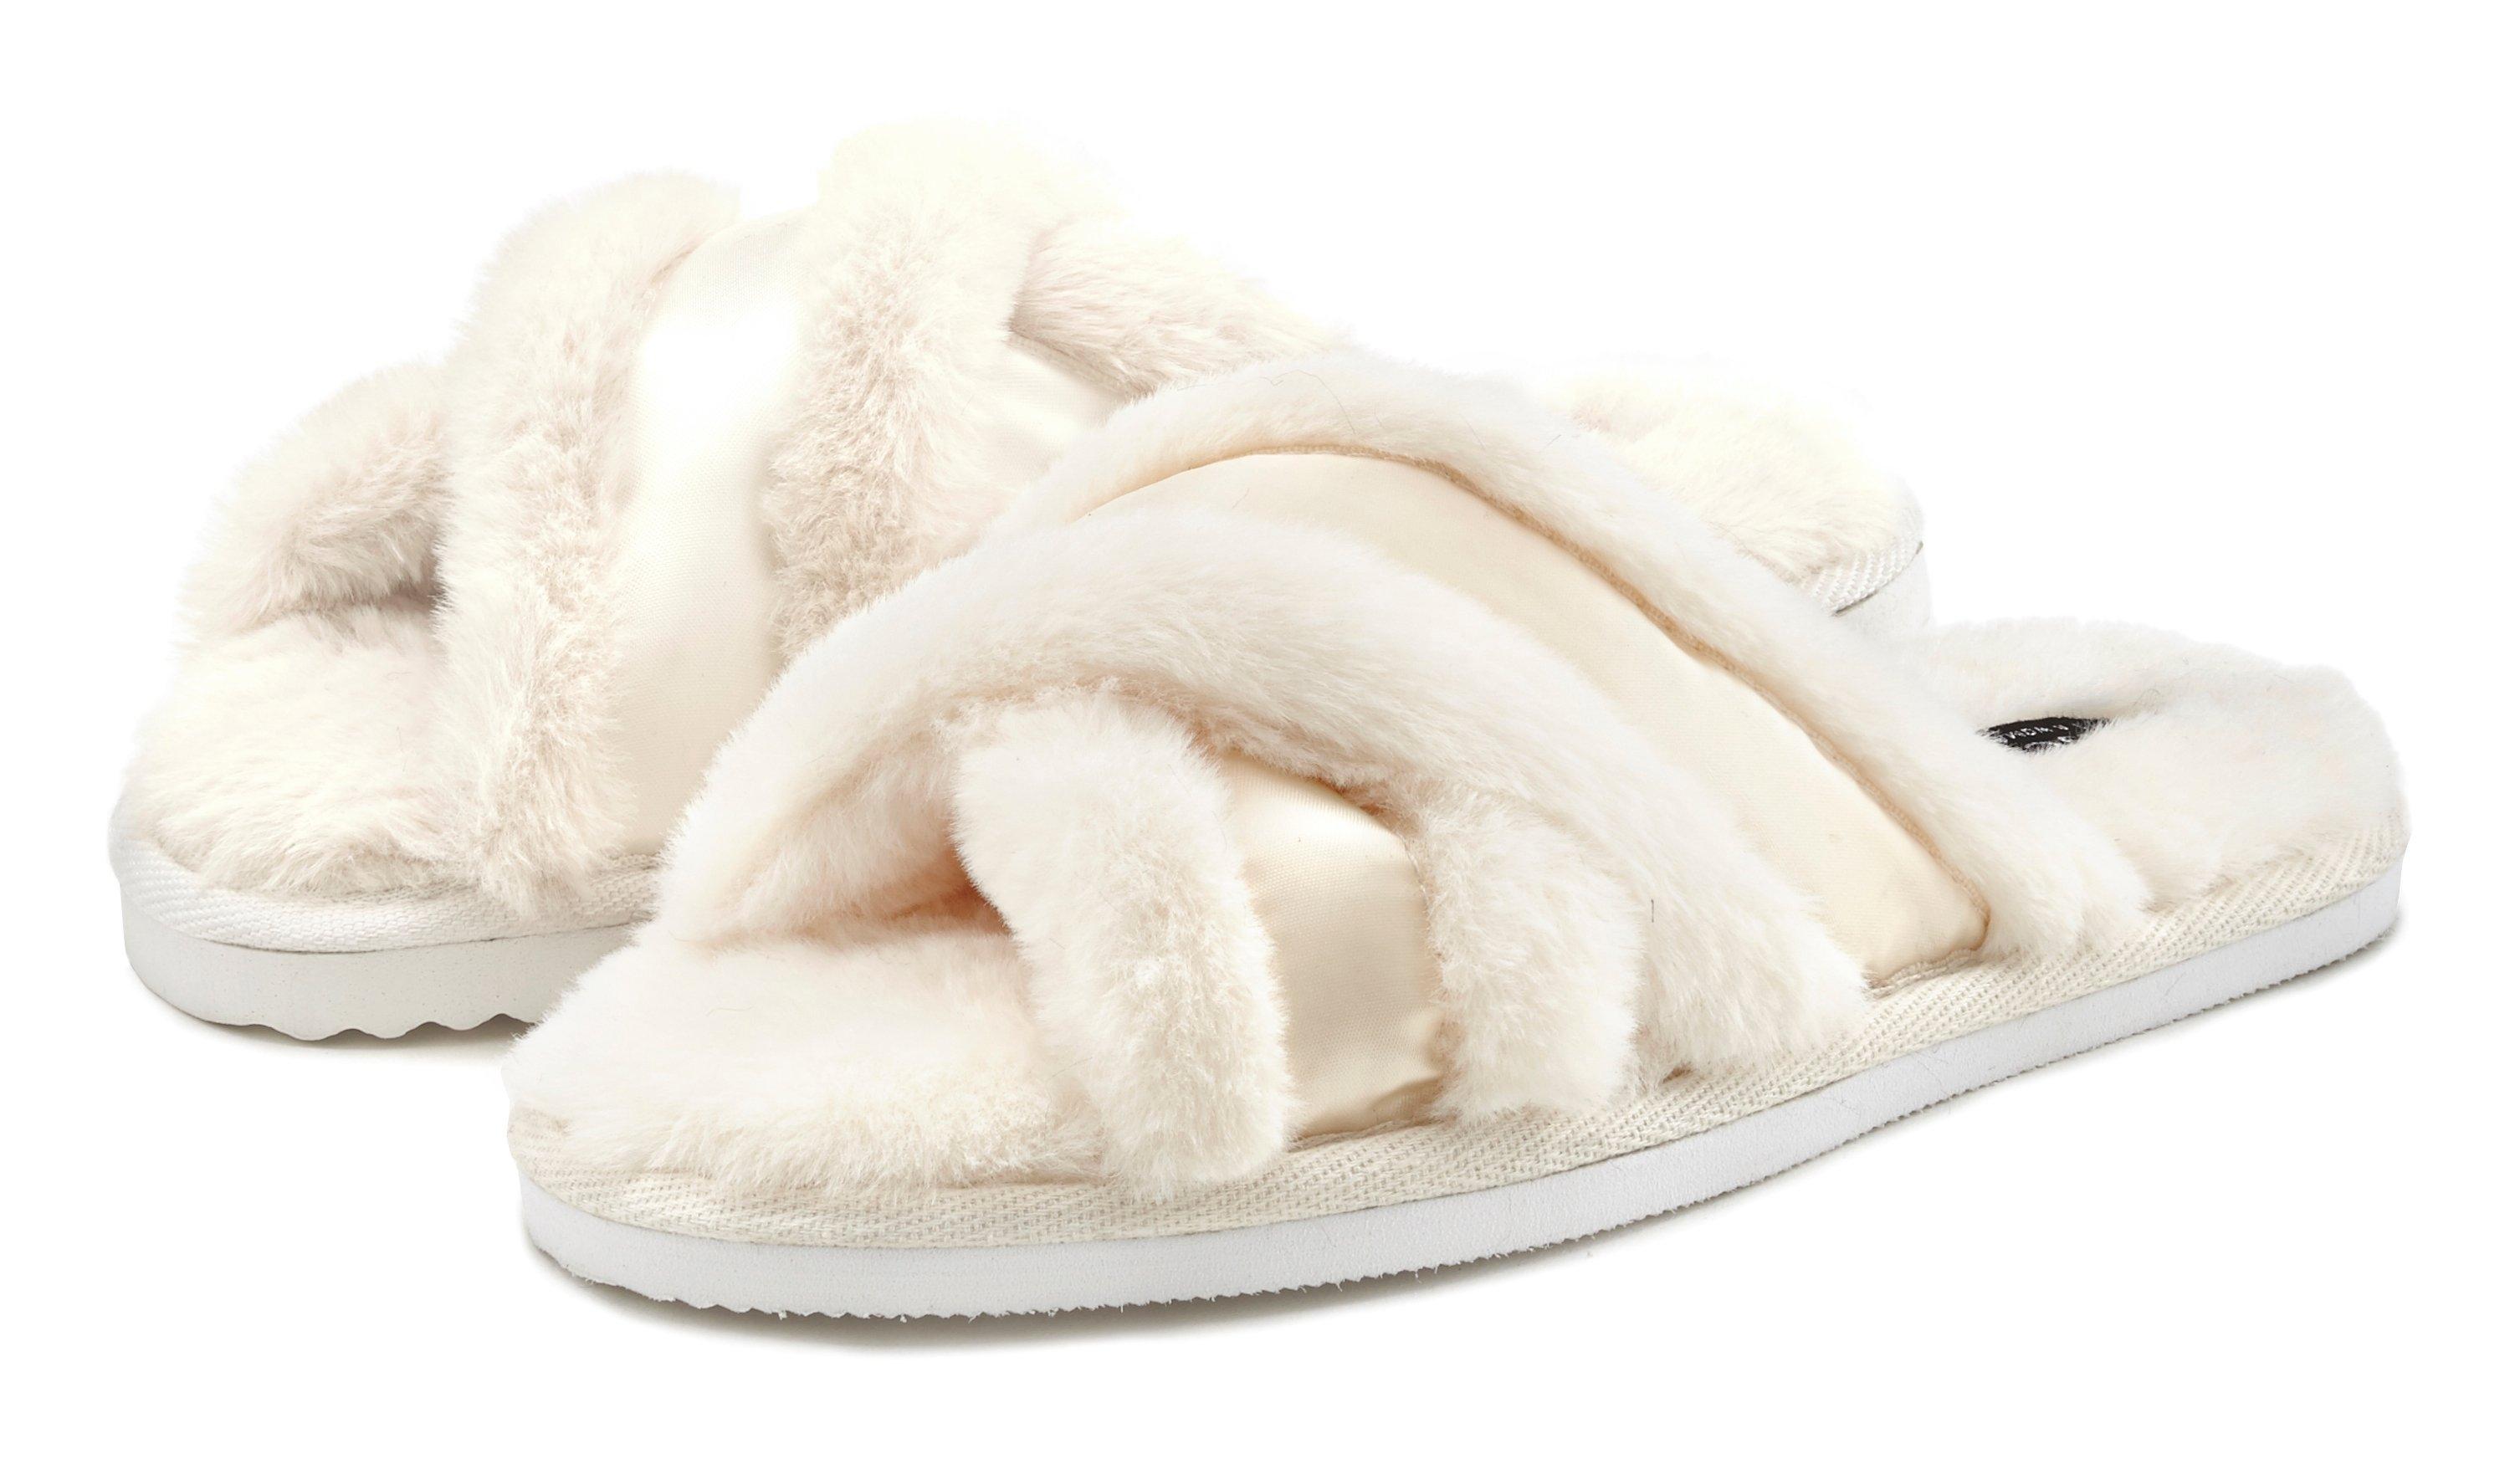 LASCANA pantoffels bij Lascana online kopen